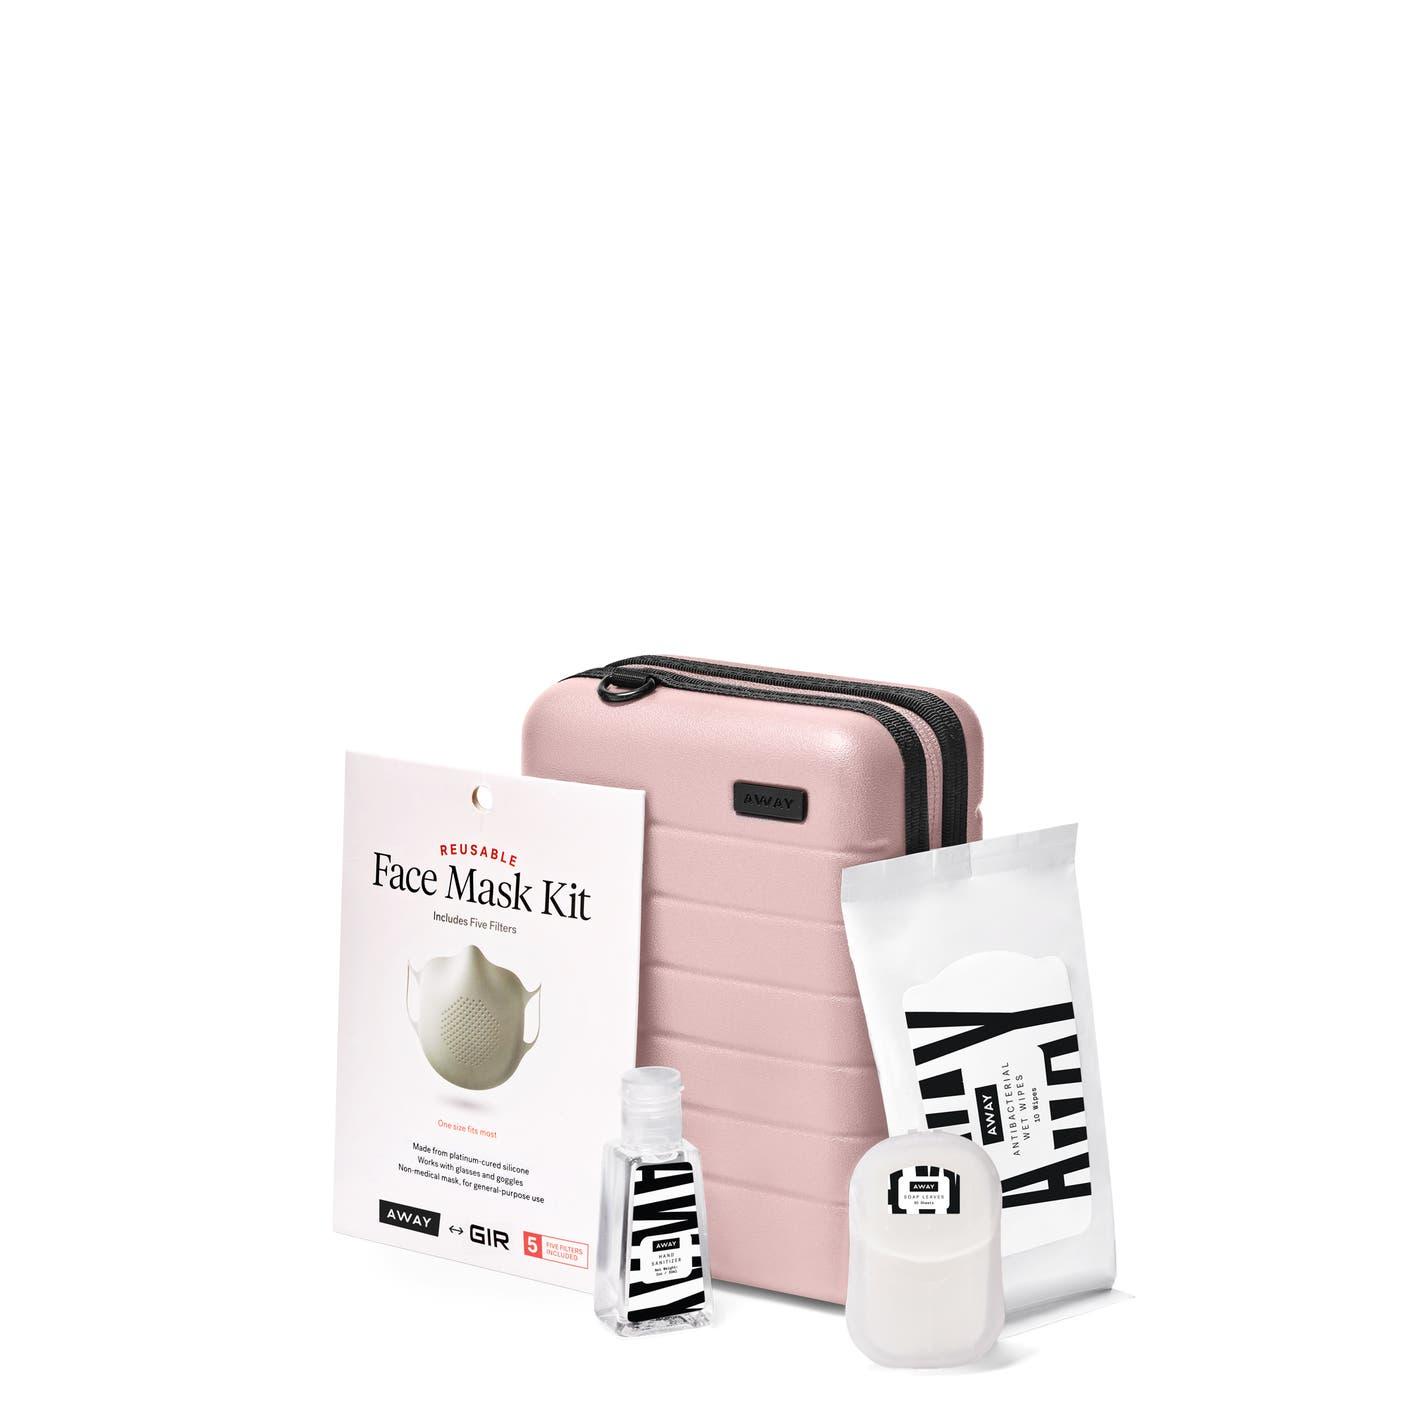 The Travel Wellness Kit